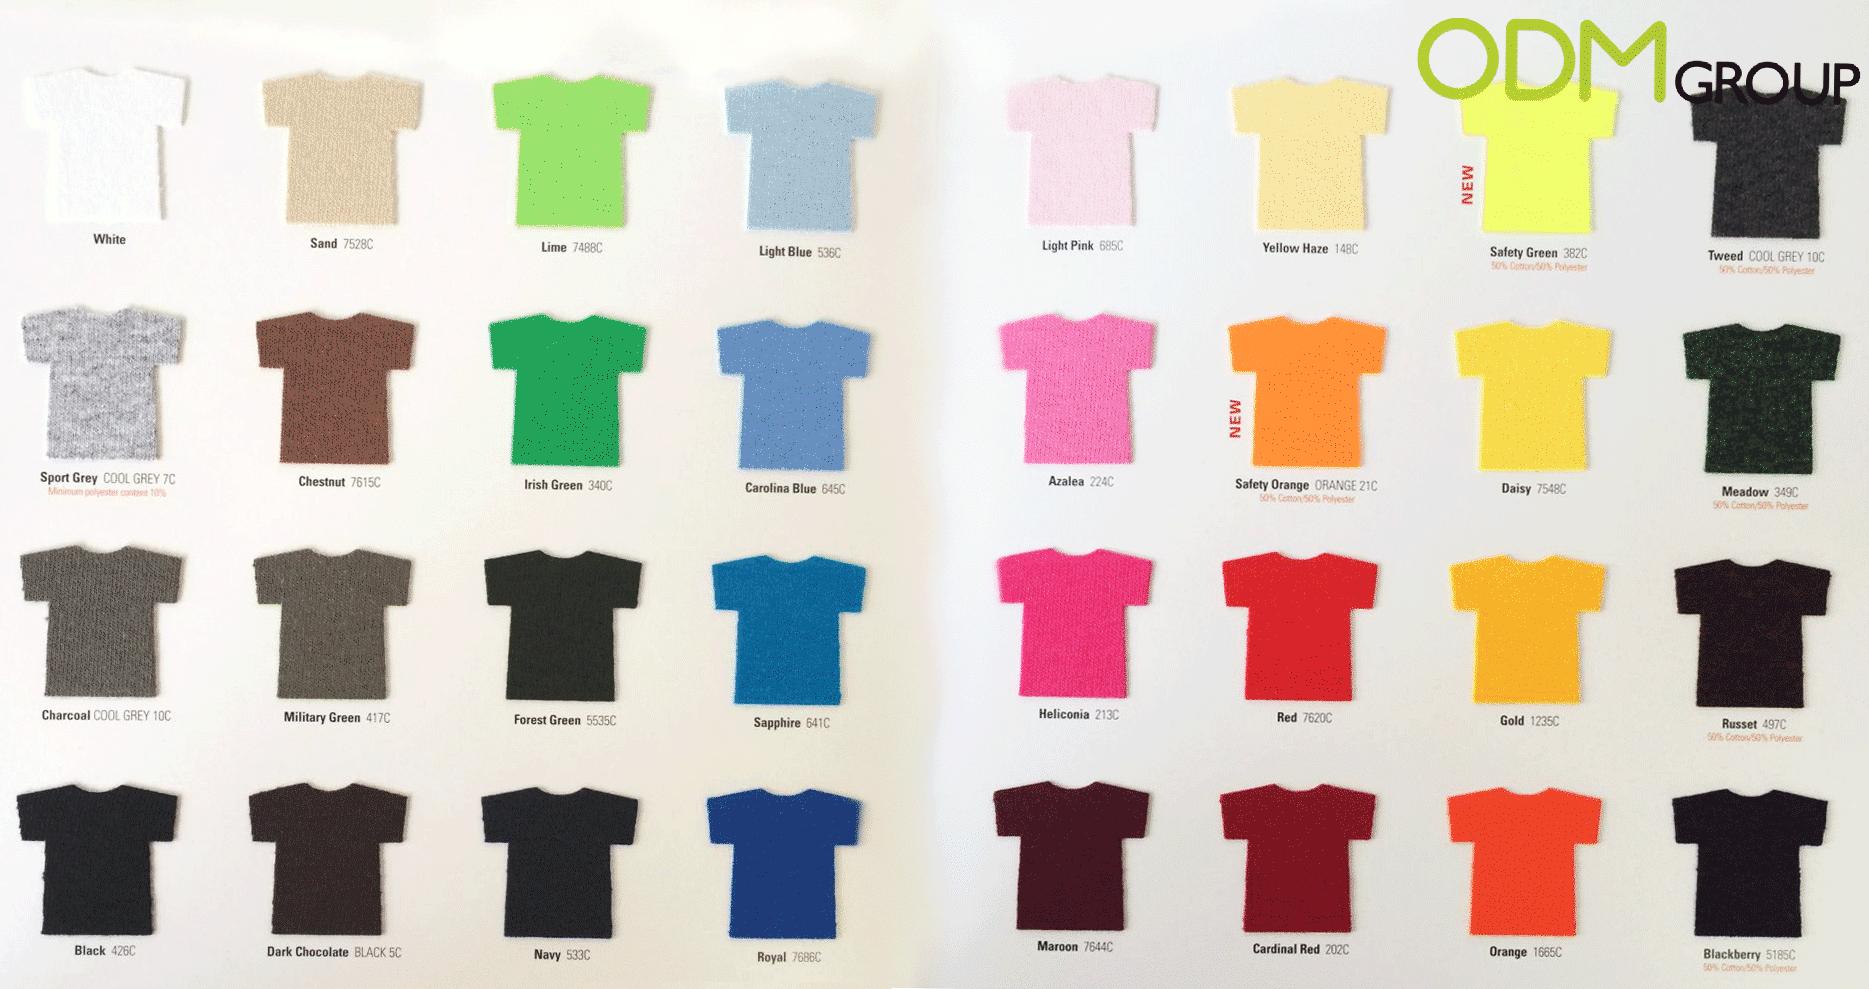 Promotional T-Shirt Phenomenon: Why So Popular?